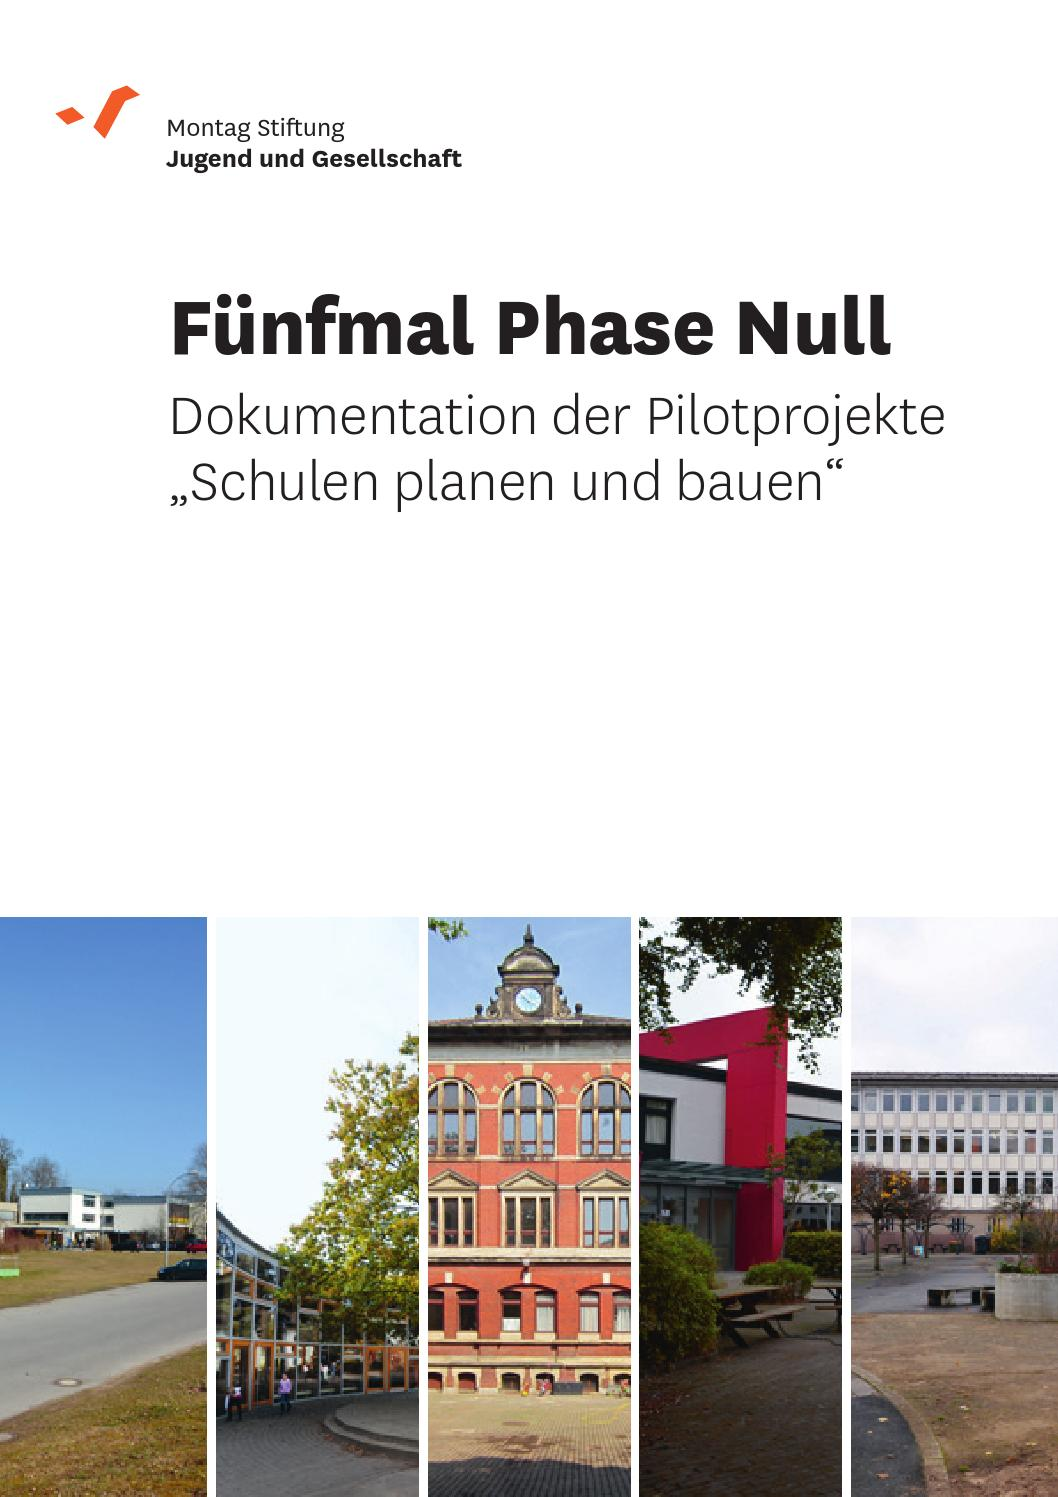 Berühmt Fahrbarer Rahmen Null Zeitgenössisch - Rahmen Ideen ...